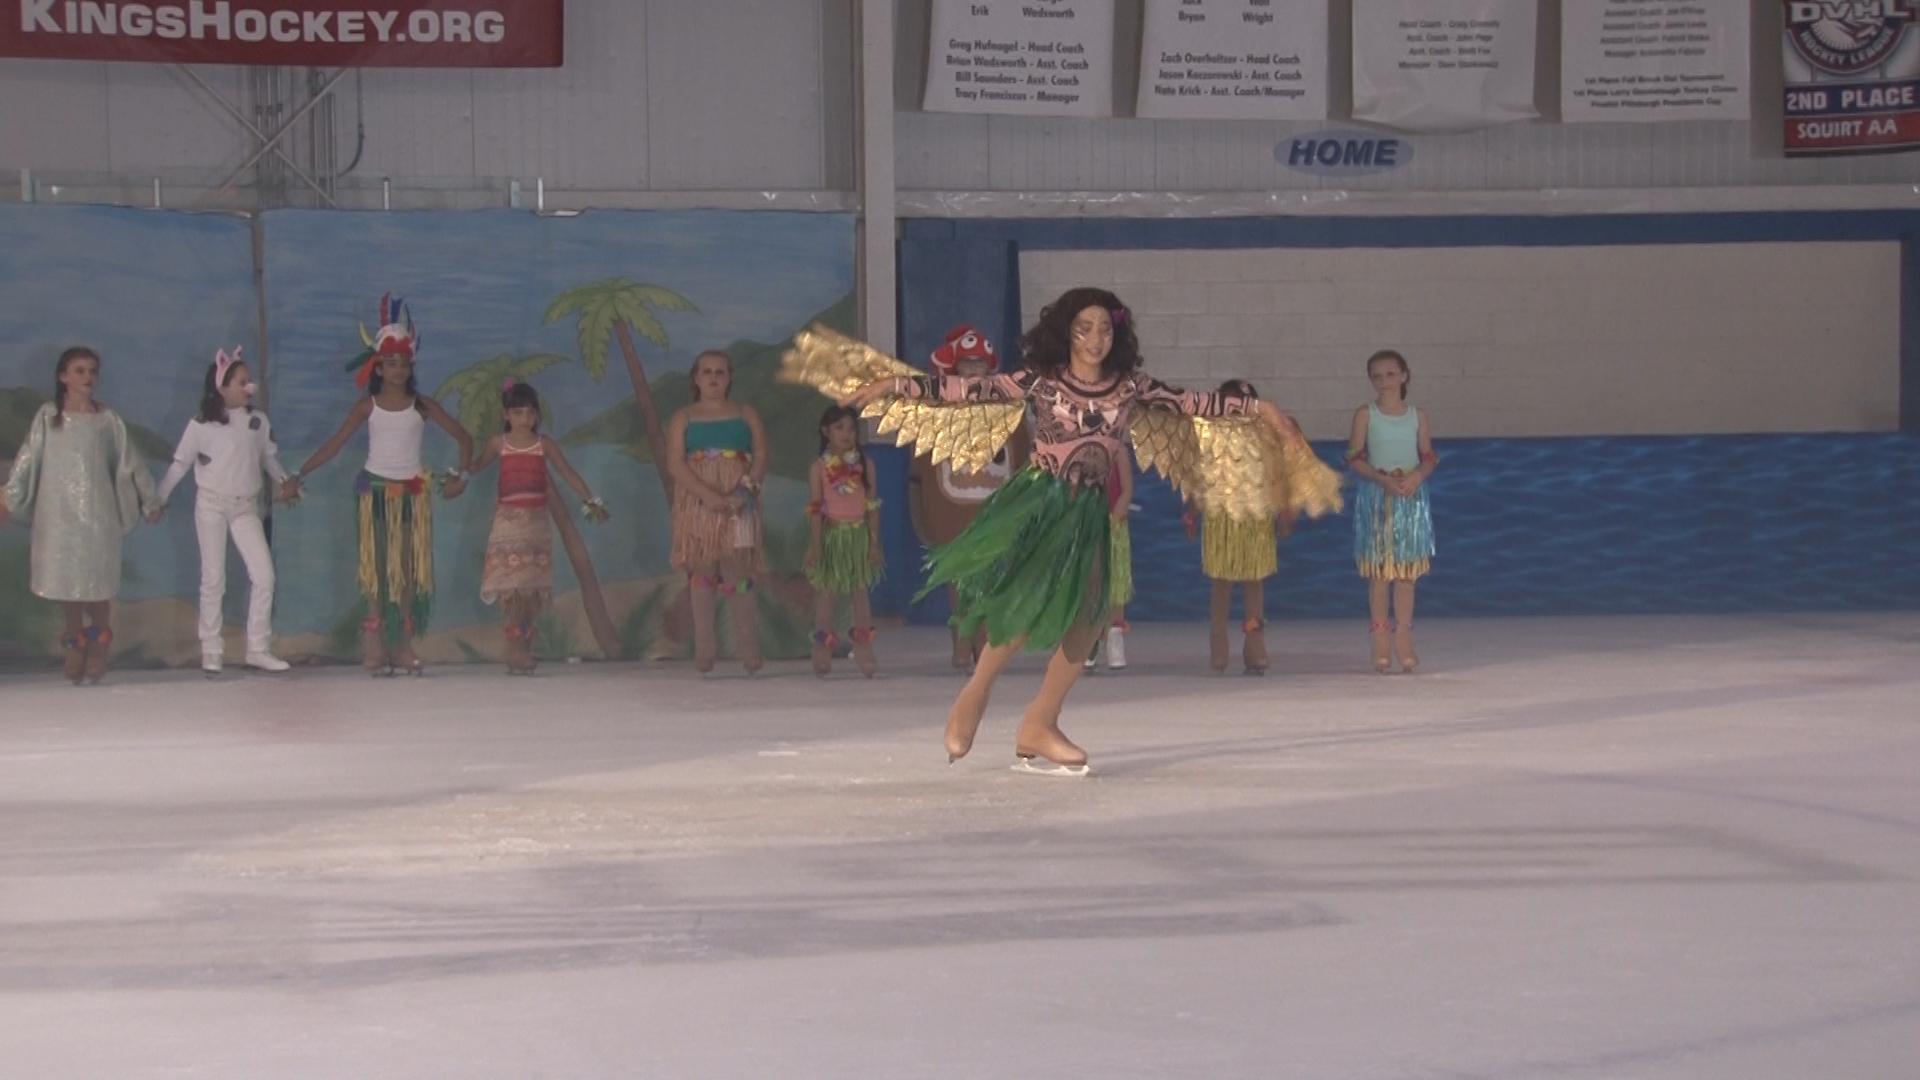 Power Play Maui Skate on Ice 071417.01_01_01_06.Still104.jpg